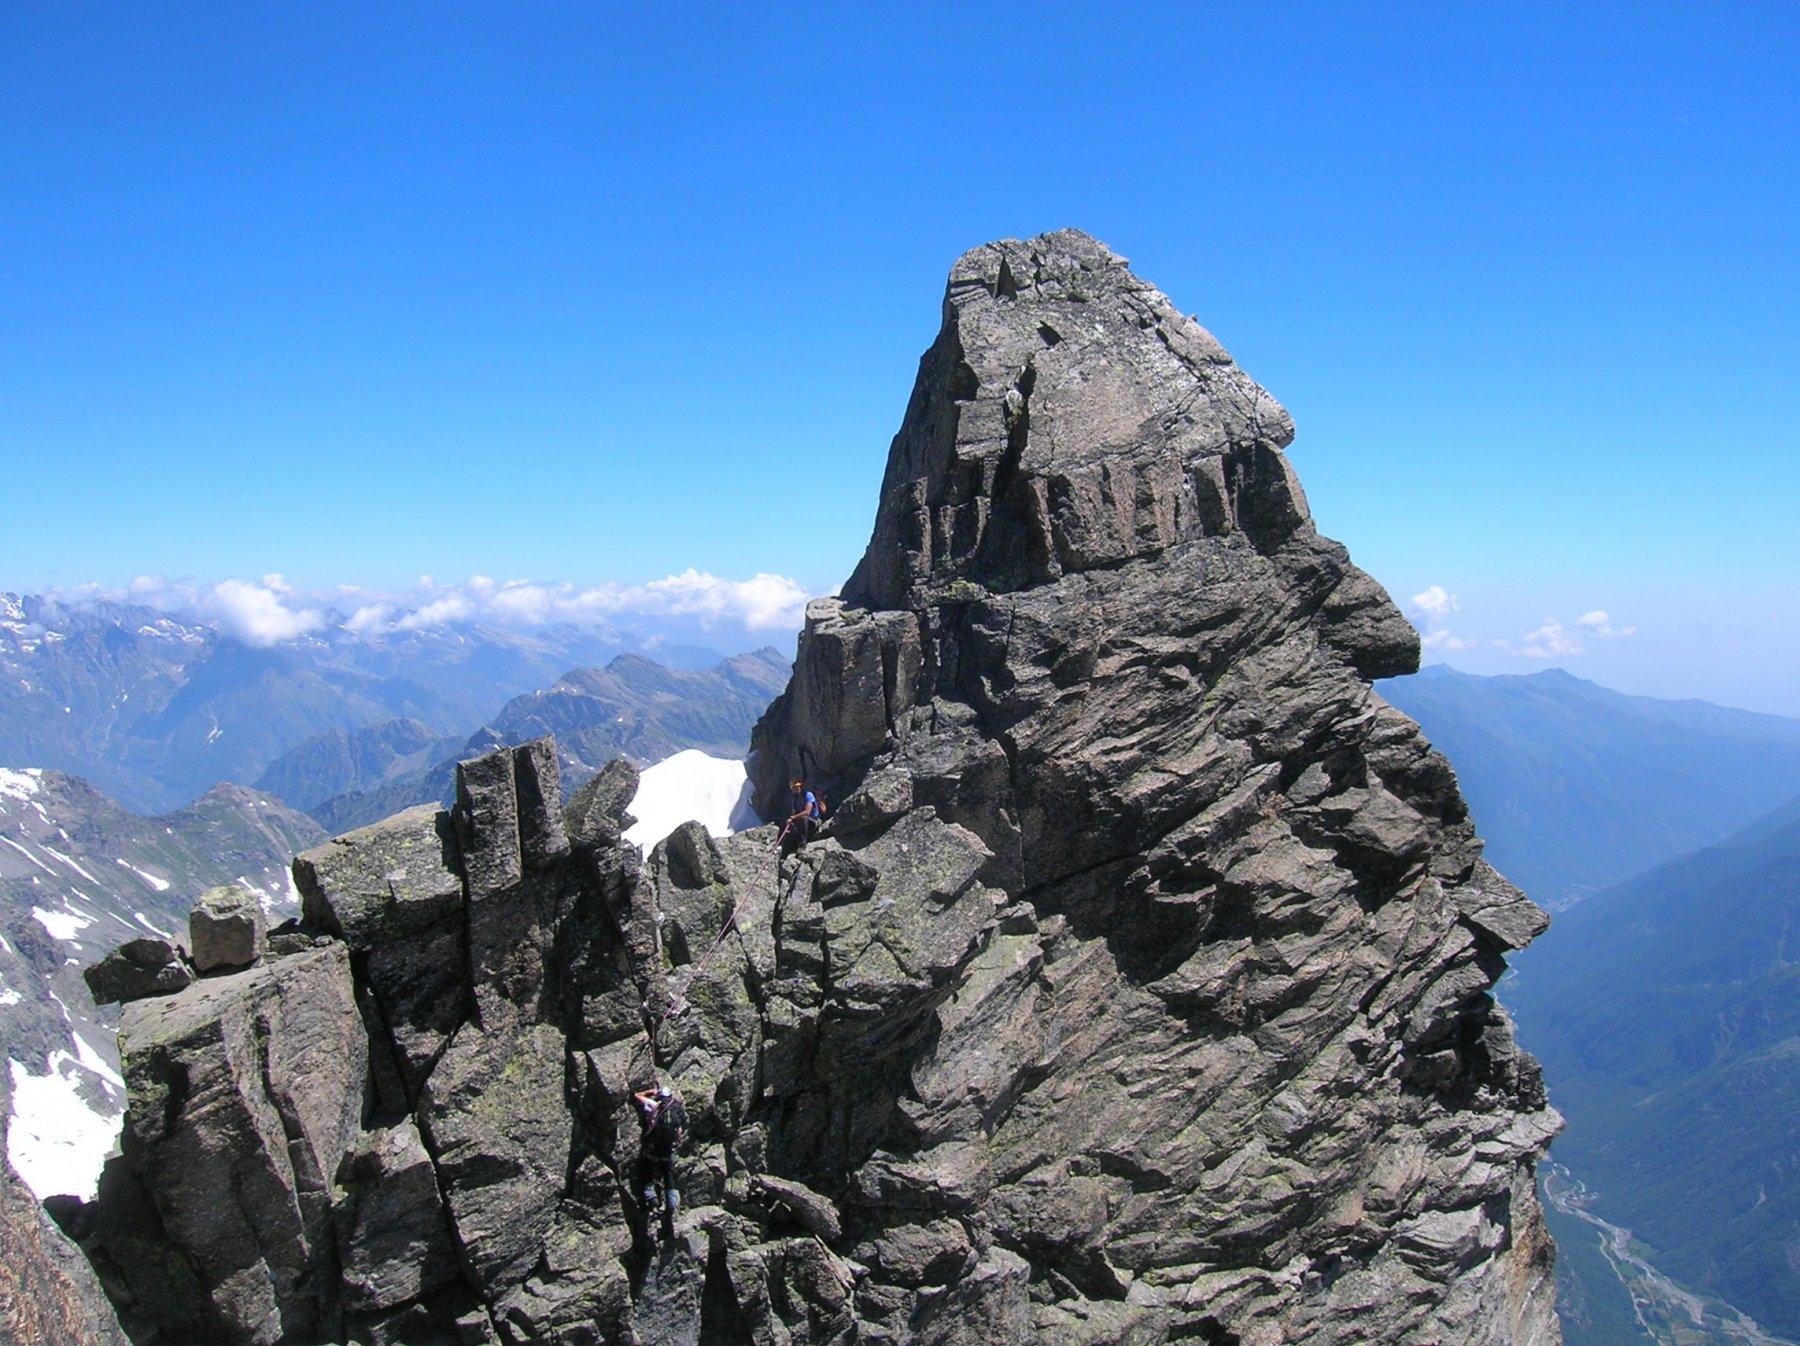 Martellot e Mulinet (Creste) da Forno Alpi Graie, traversata integrale 2016-07-10